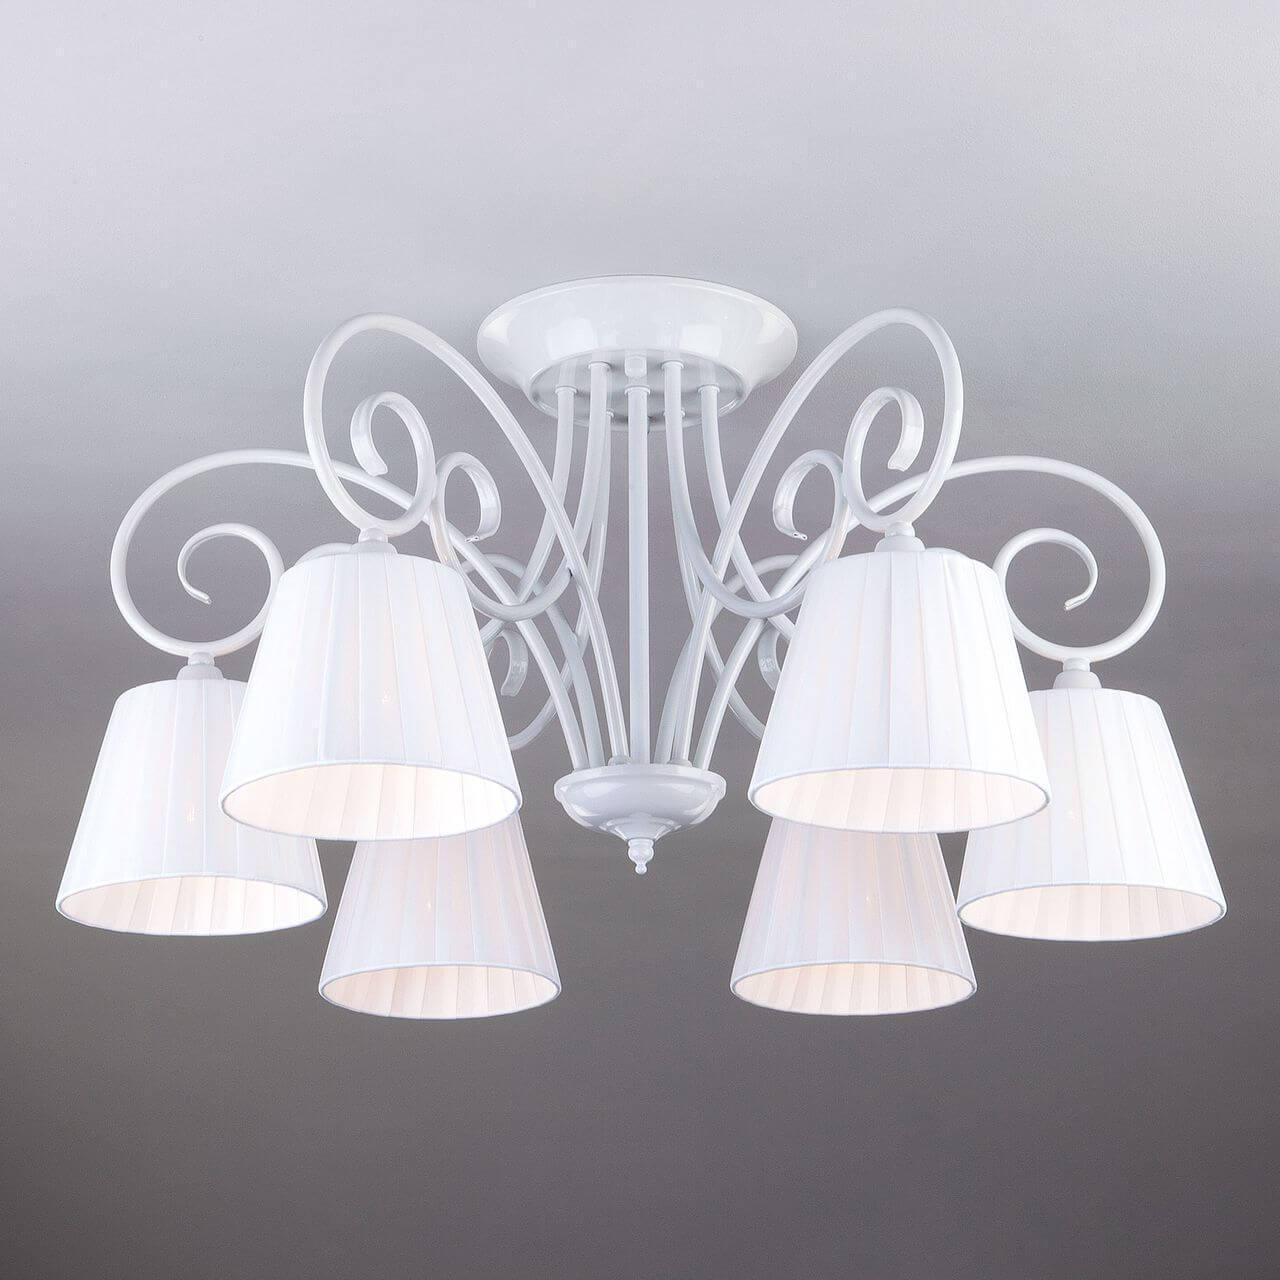 Неоновые лампы, цветовая палитра неоновых ламп, неоновые